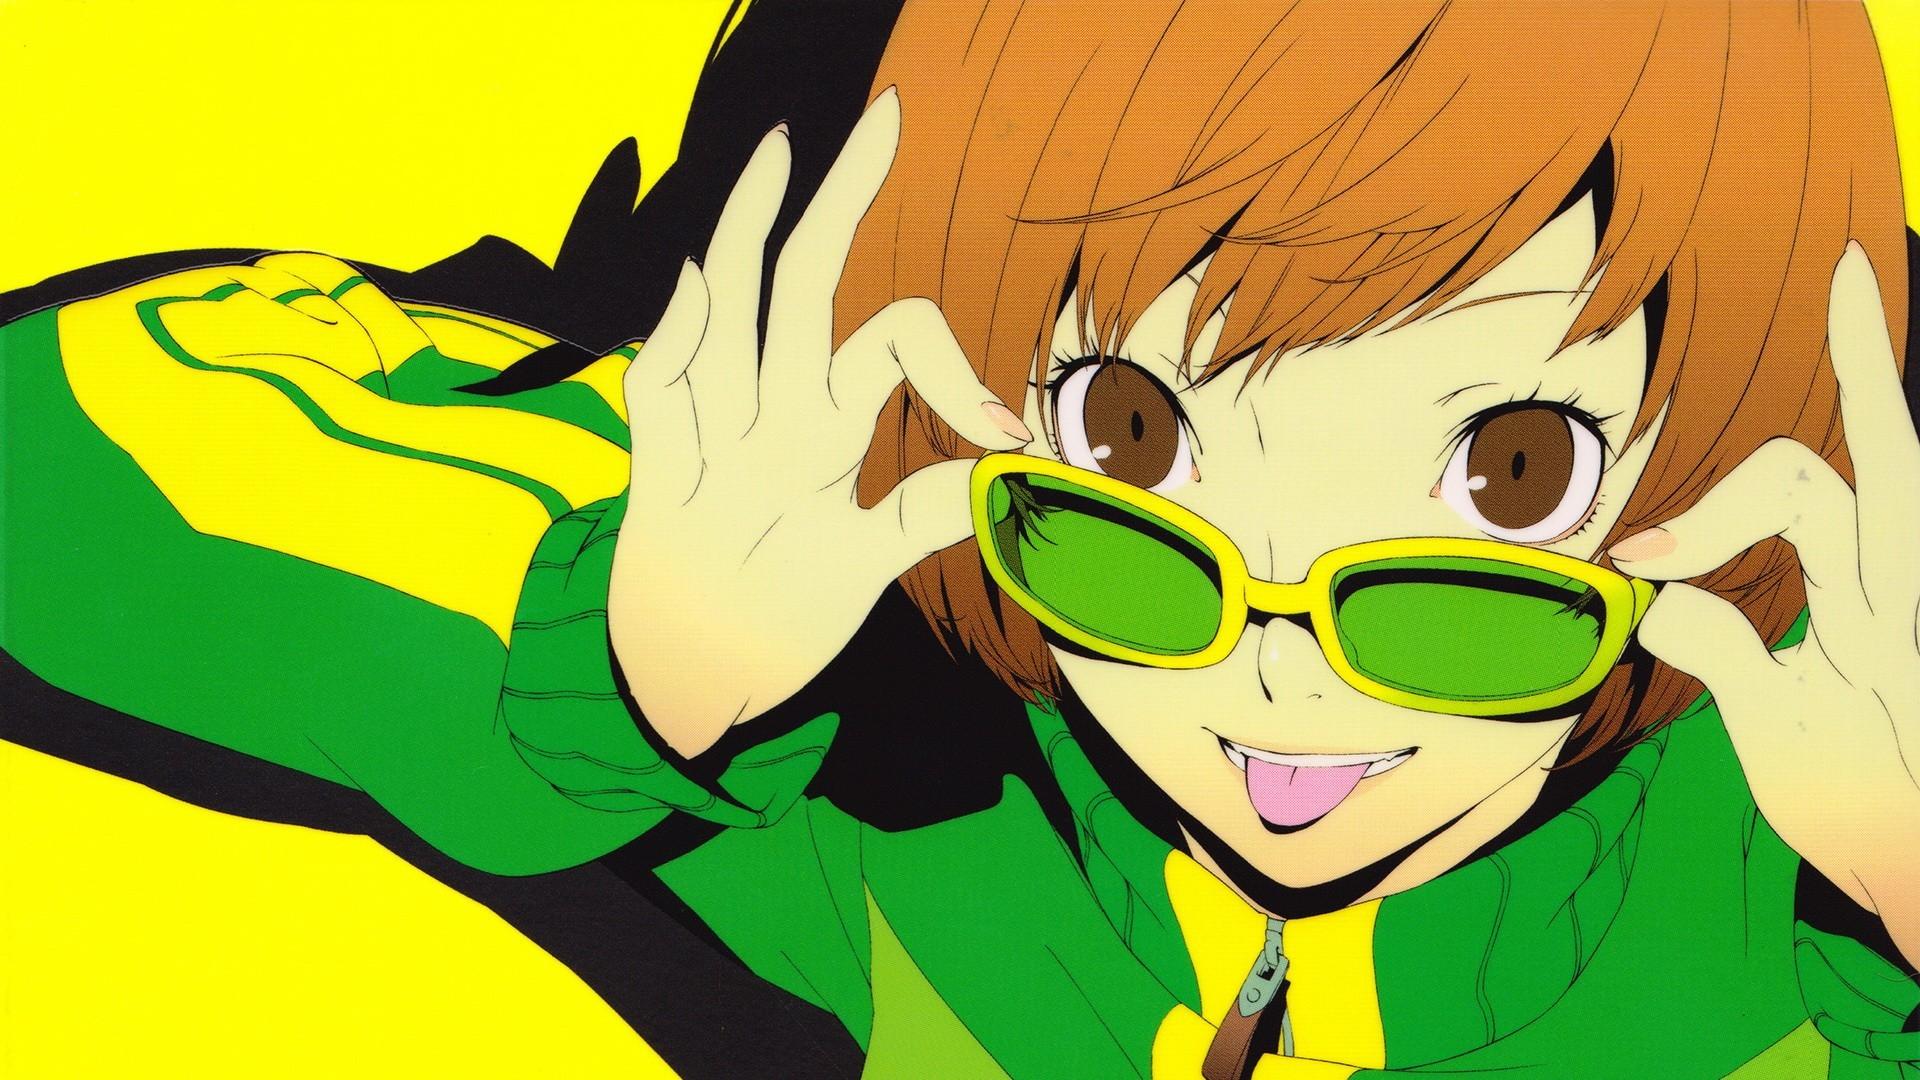 Brown Eyes Brunettes Close-up Faces Glasses Meganekko Persona 4 Series  Satonaka Chie Shin Megami Tensei Short Hair Simple Background Soejima  Shigenori …